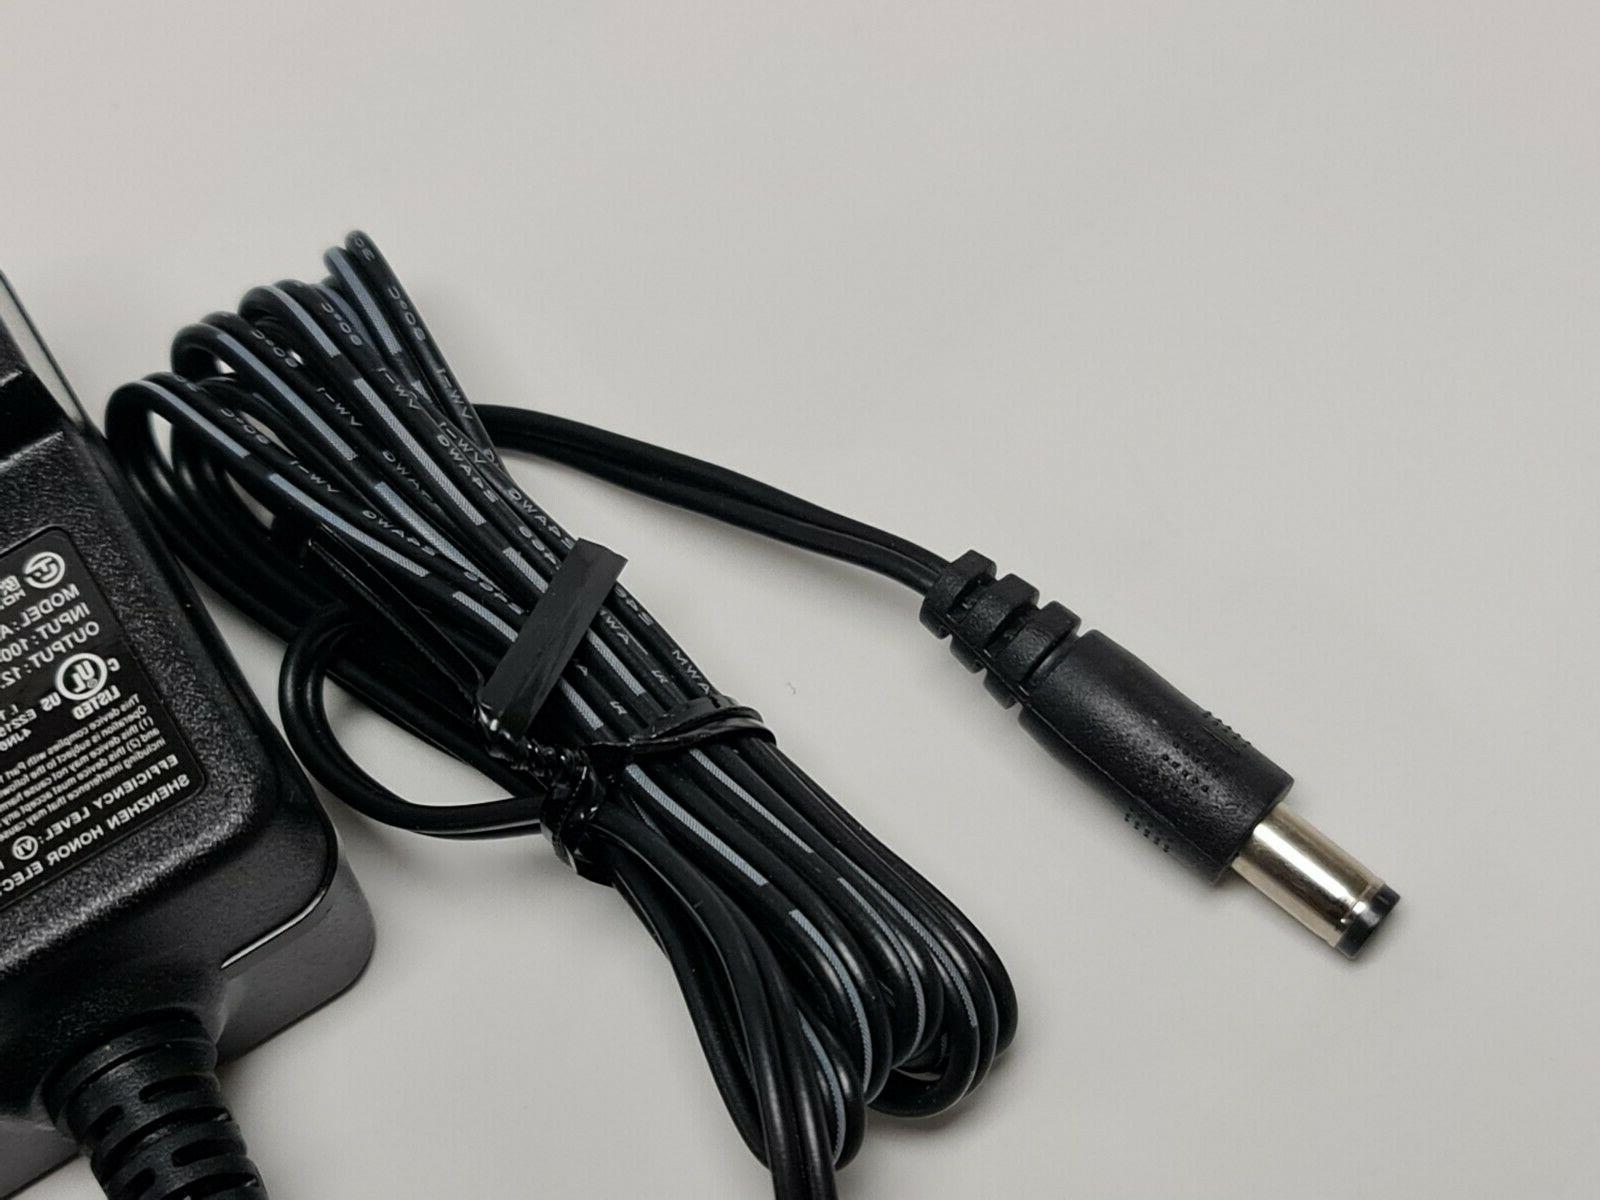 LOREX ORIGNAL 4K 60 12VDC Power For LOREX Cameras